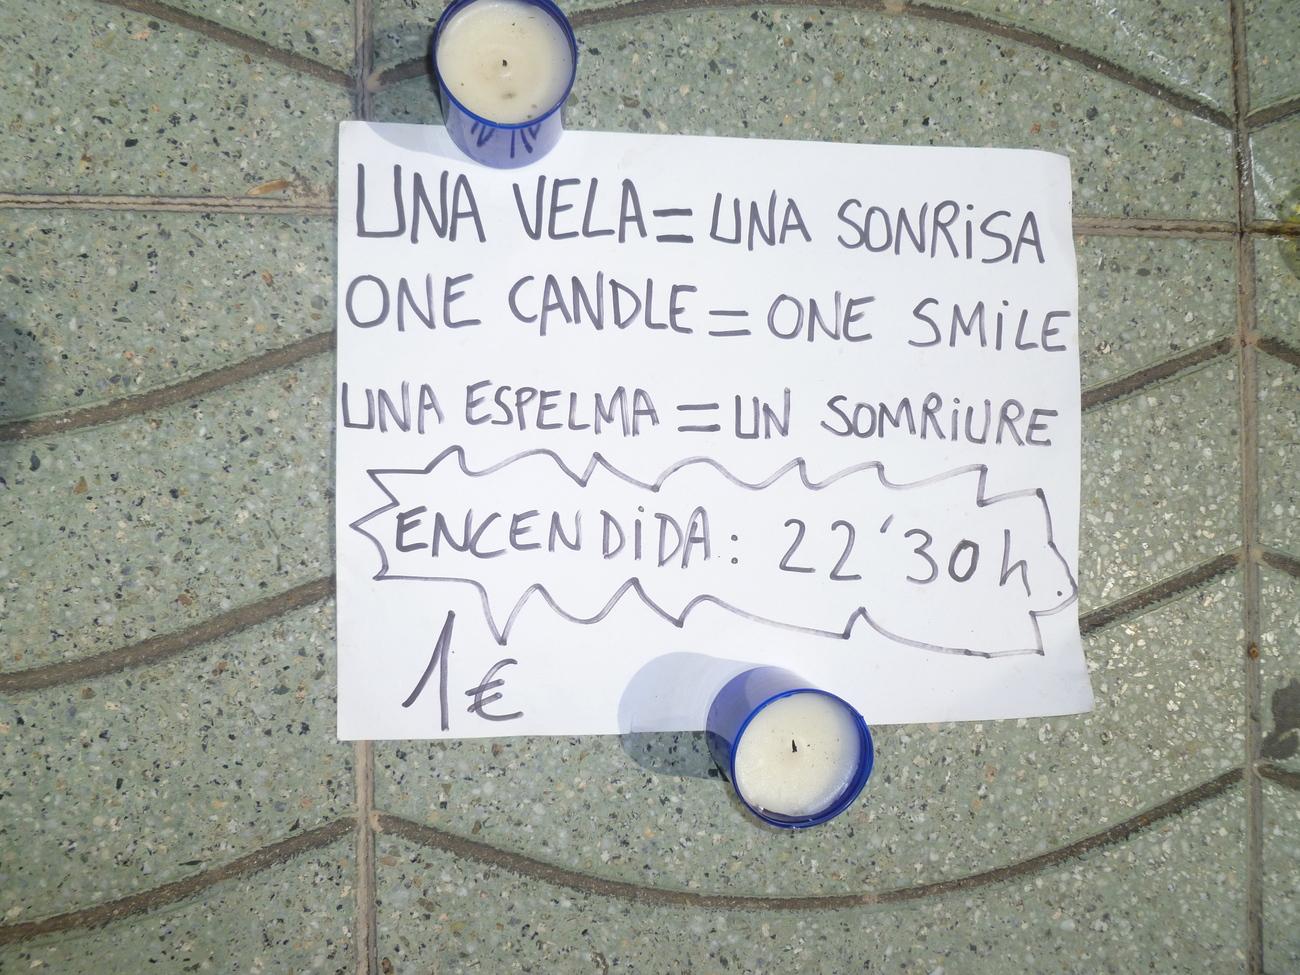 vela-sonrisa-8